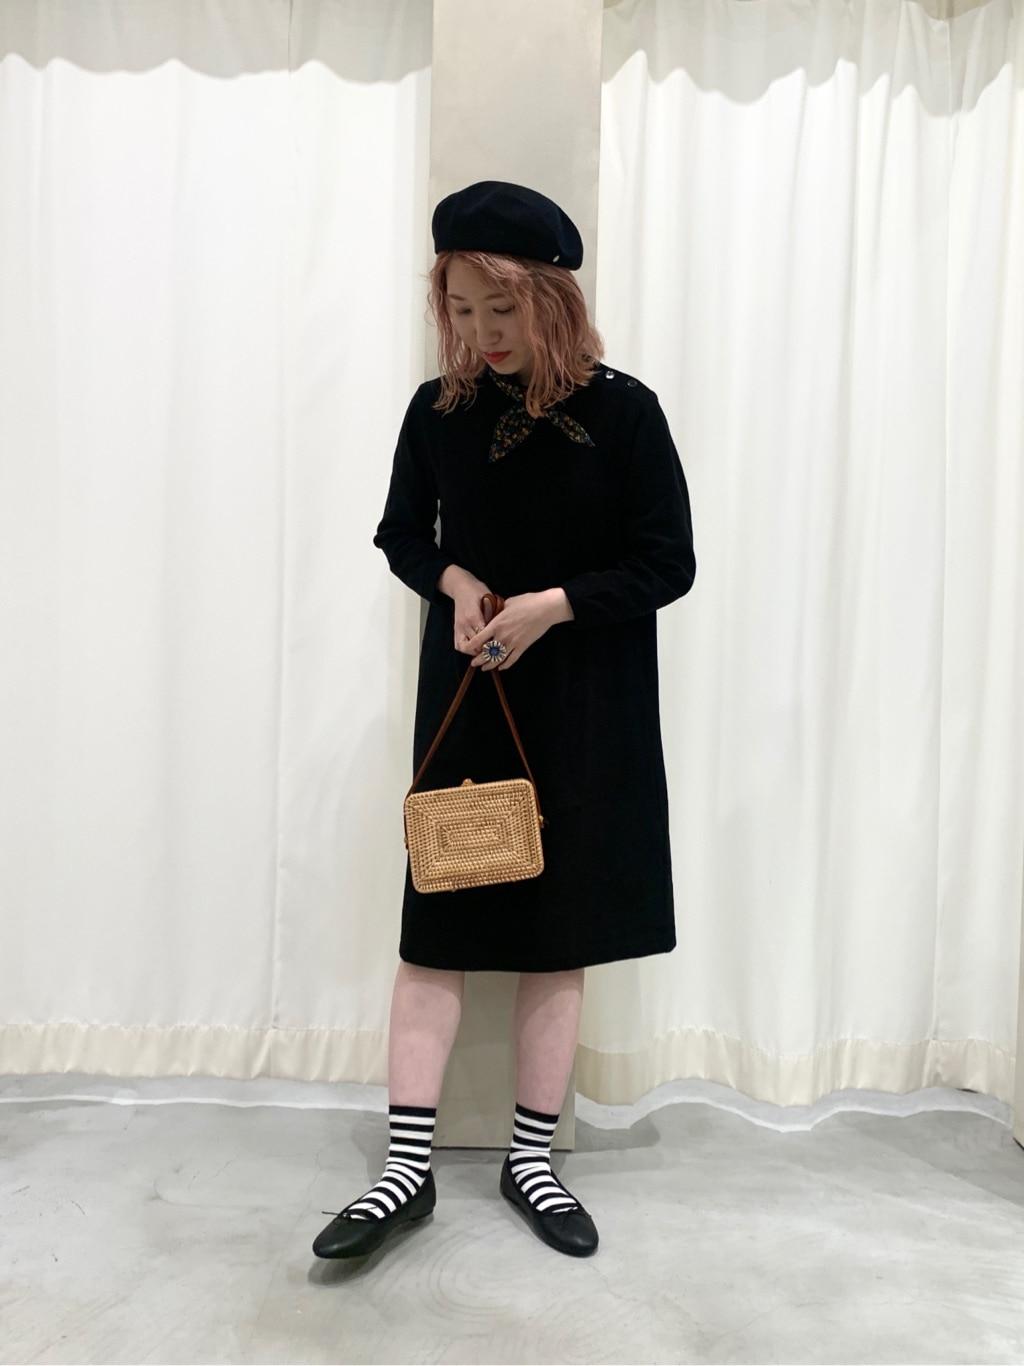 - CHILD WOMAN CHILD WOMAN , PAR ICI 東京スカイツリータウン・ソラマチ 身長:160cm 2021.04.28